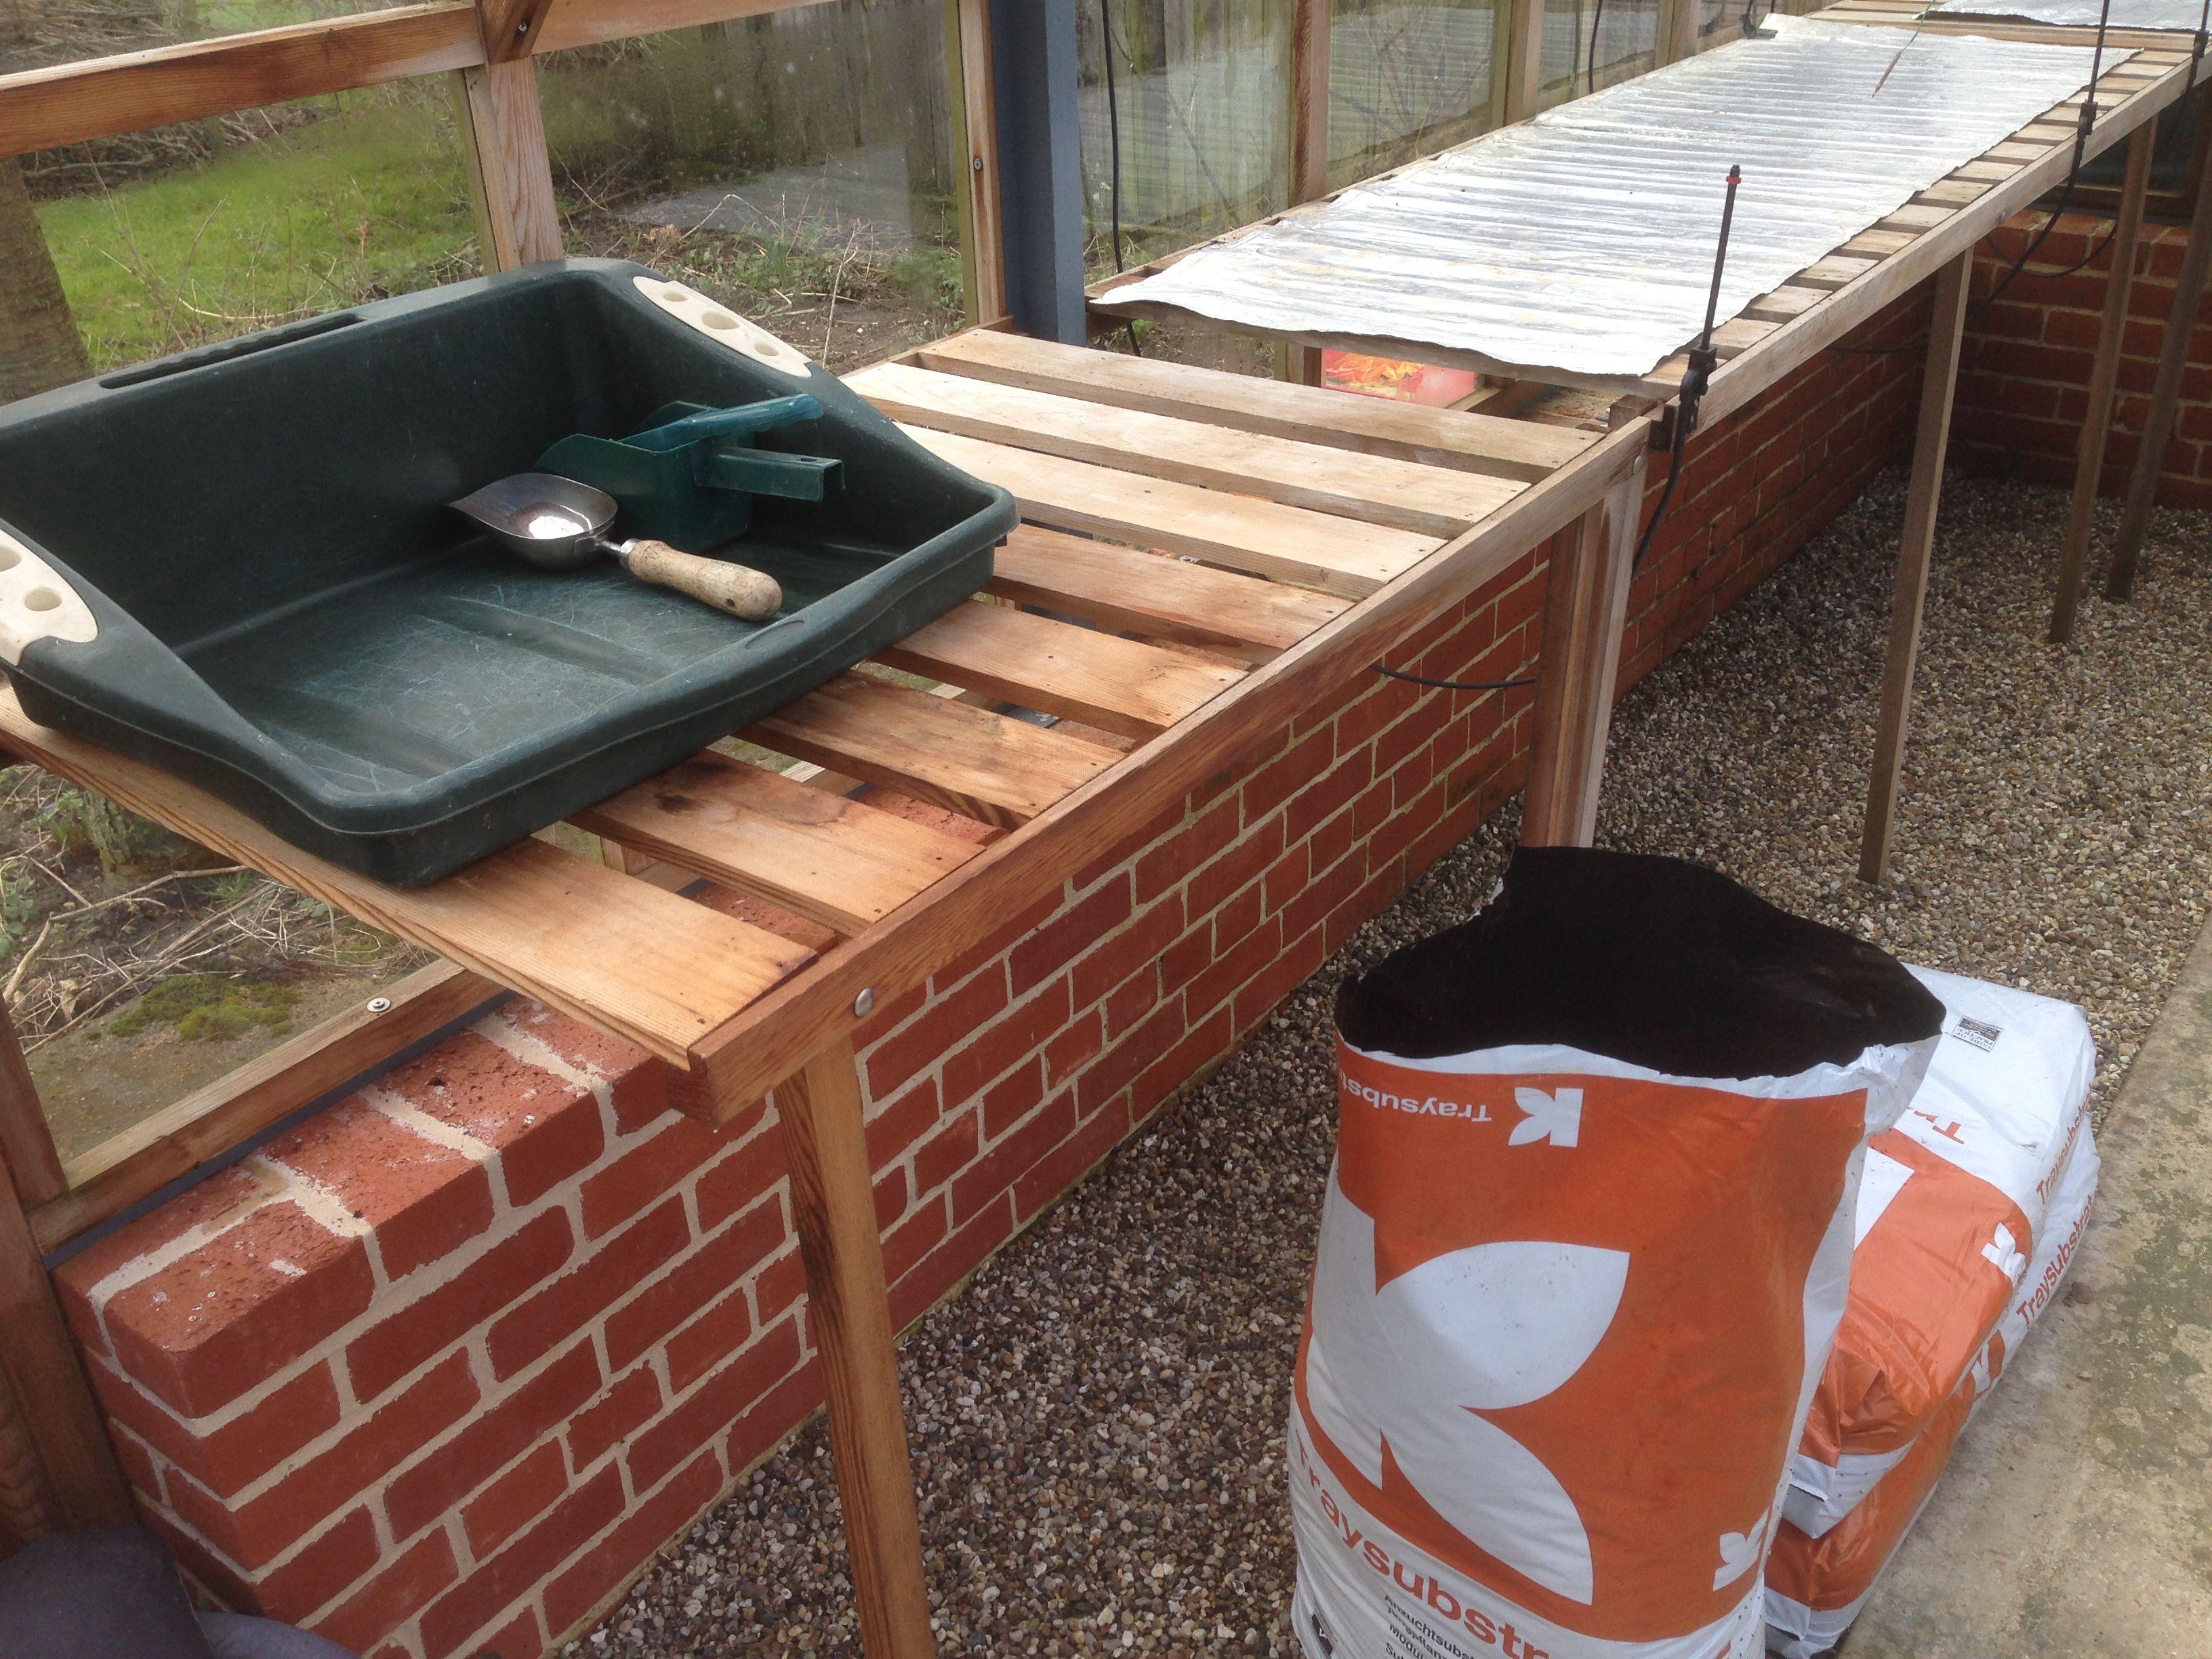 The potting station all ready to go! Farm gardens